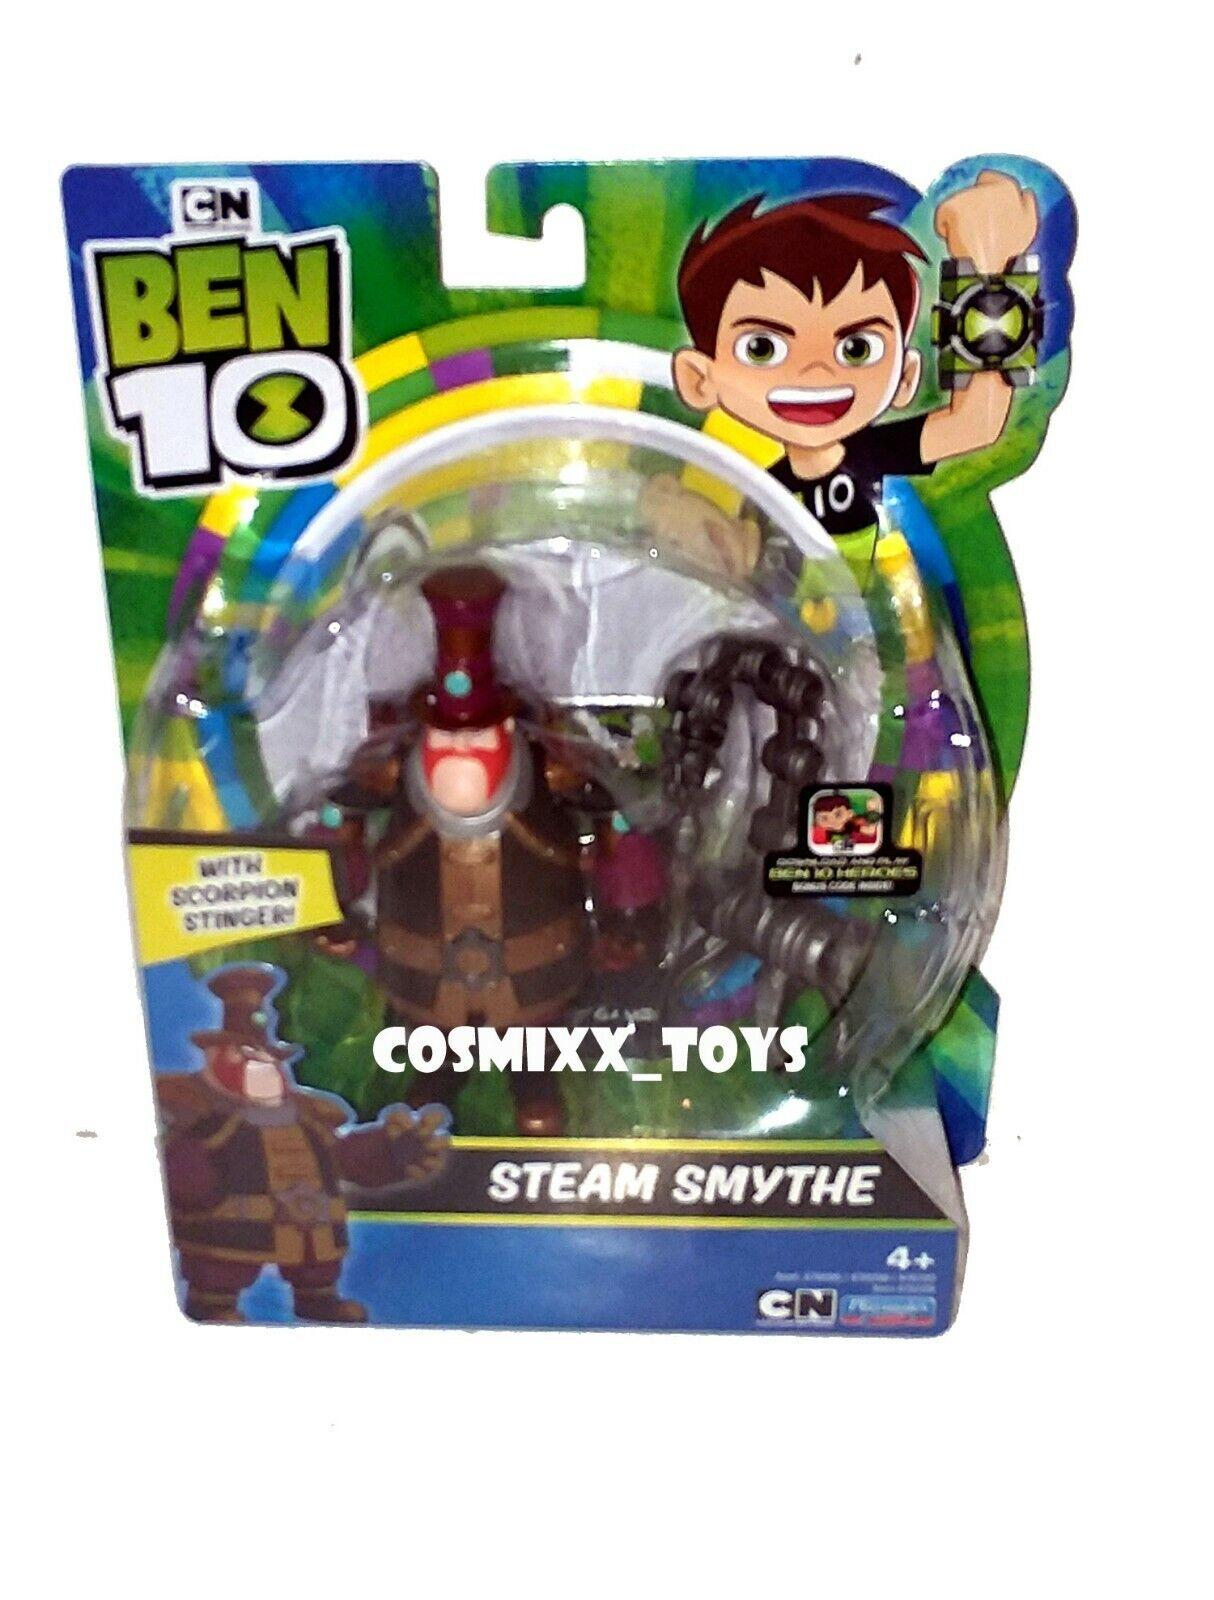 Ben 10 vapeur Smythe figurine avec Scorpion Stinger figurine action Portable 2636